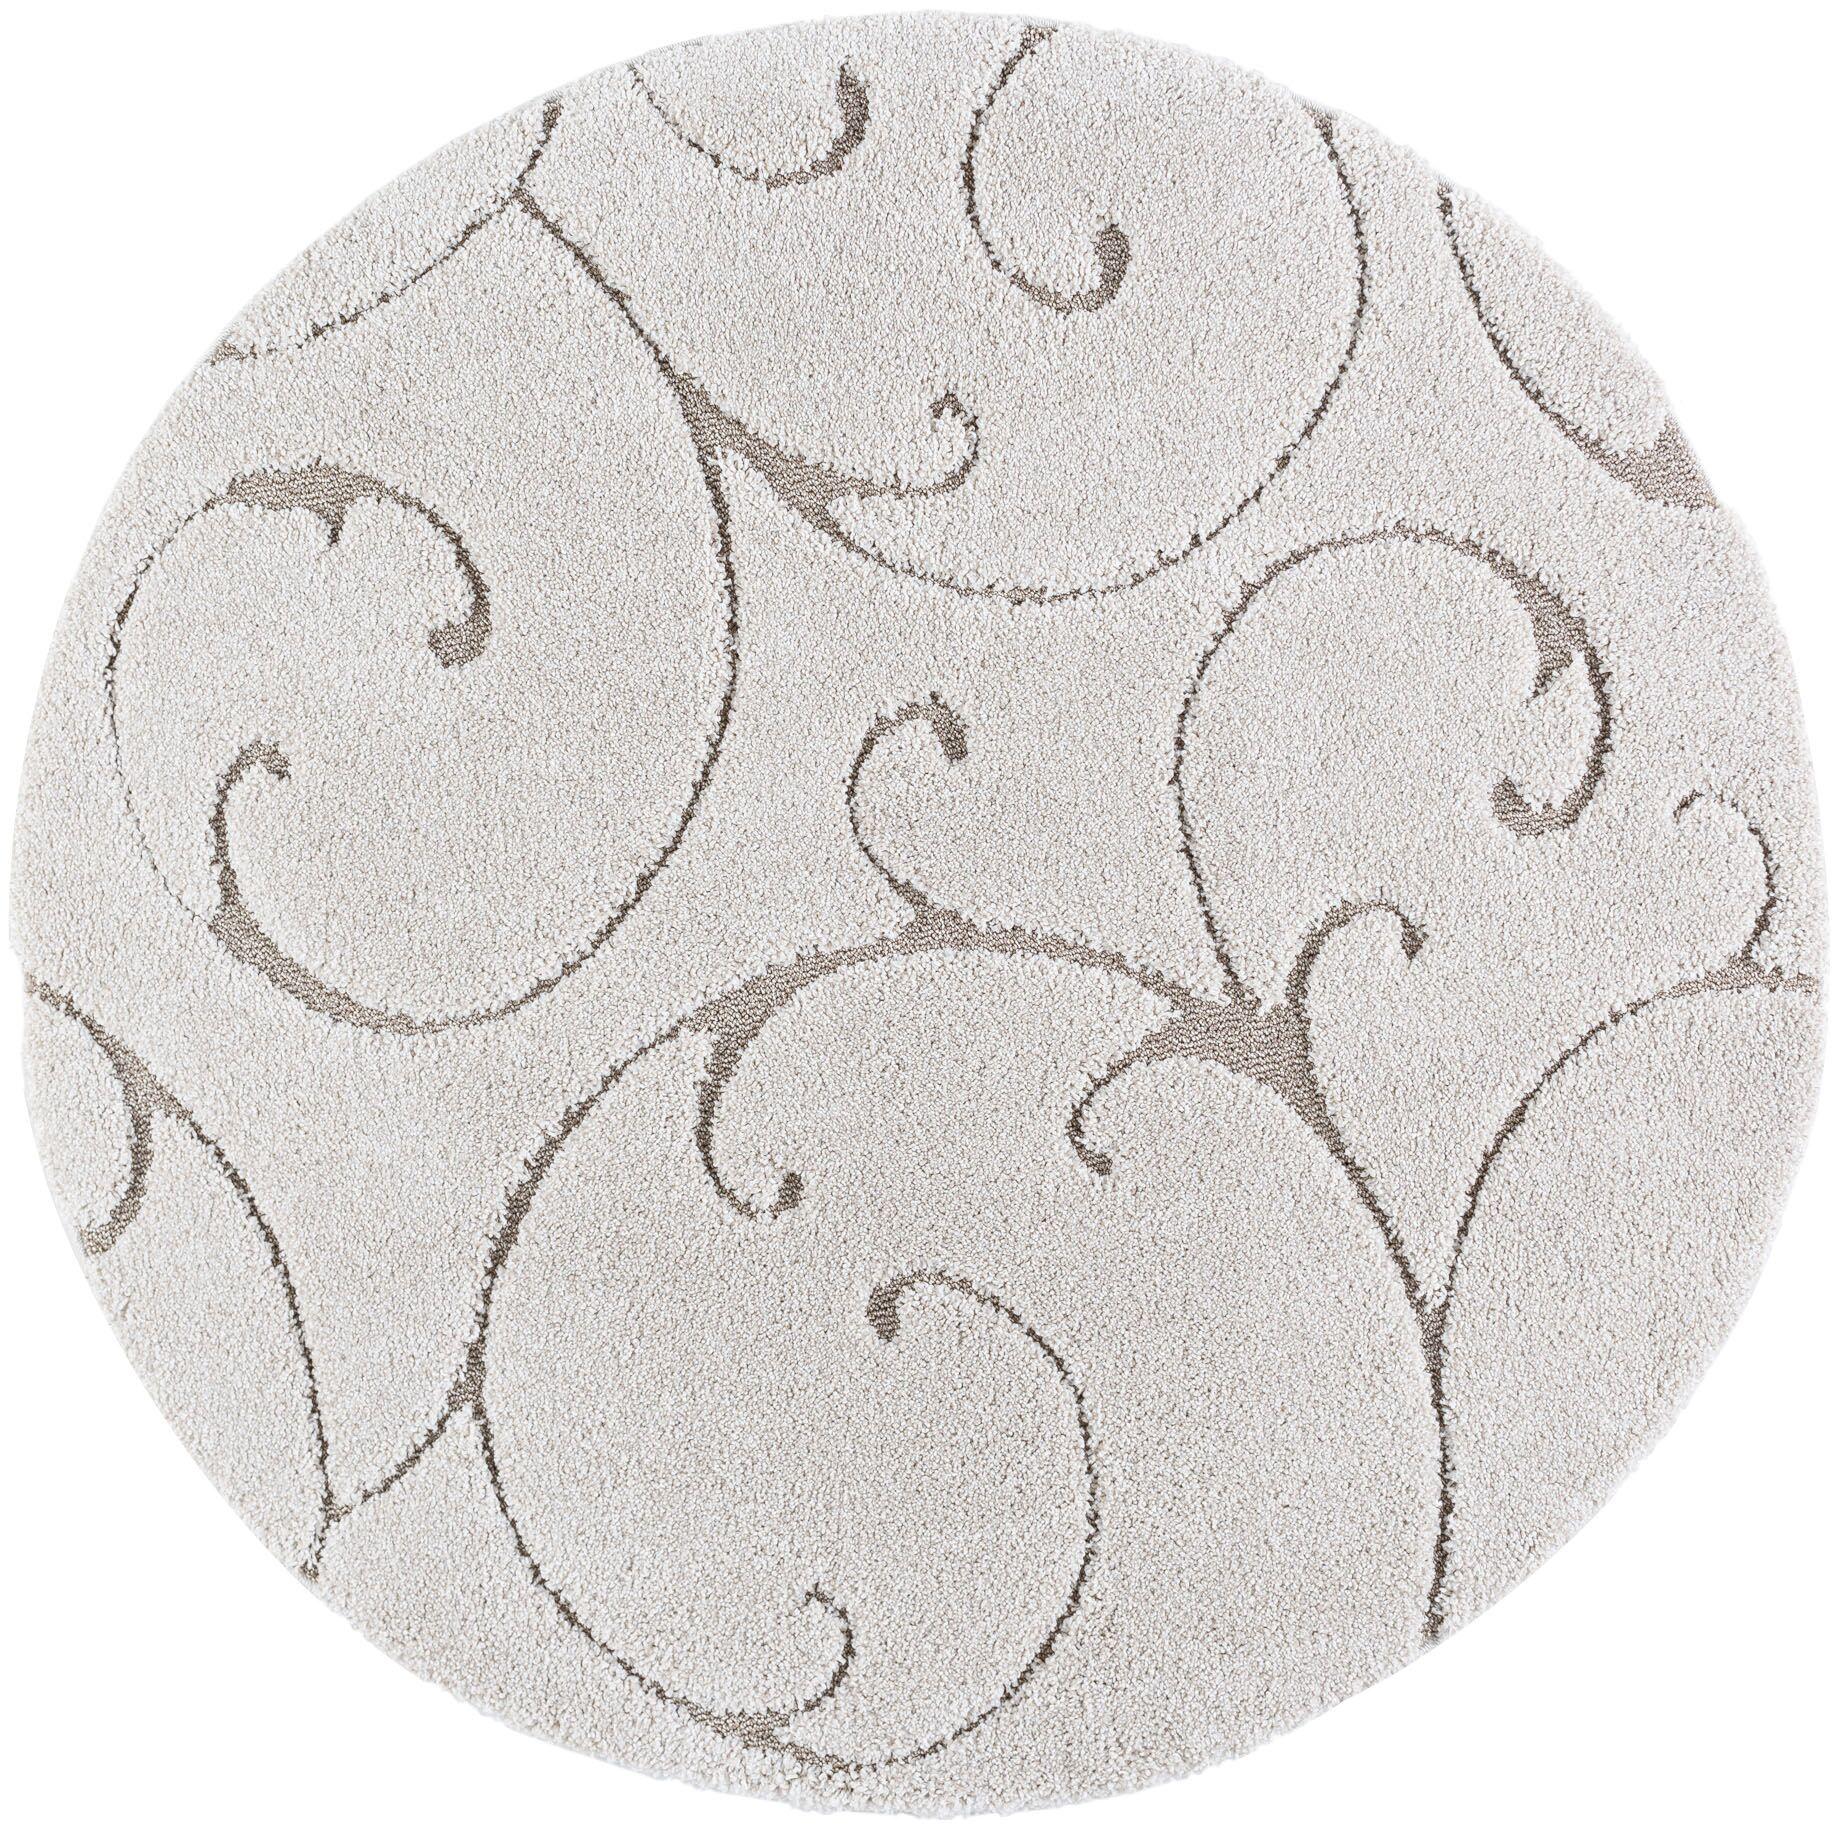 Edda Scrollwork Scatter Cream Area Rug Rug Size: 5'3'' Round